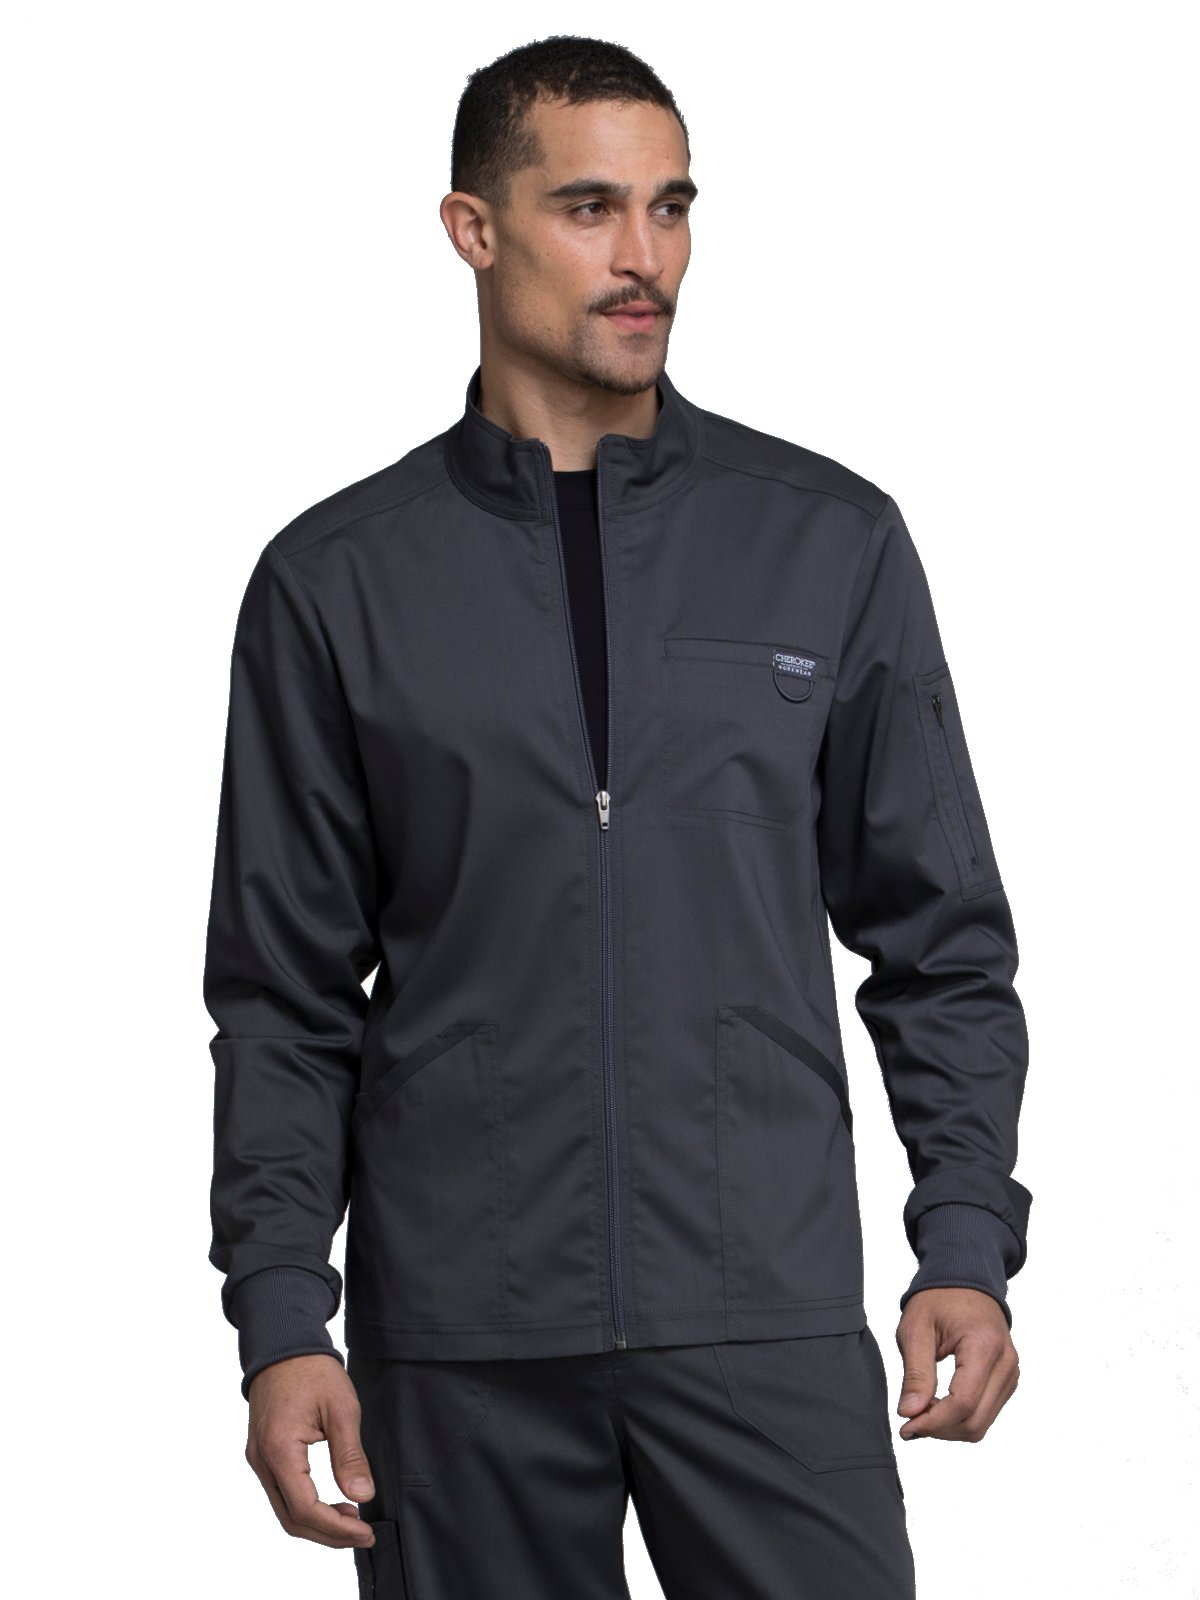 Cherokee Revolution Workwear Men's Zip Up Solid Scrub Jacket Small Pewter